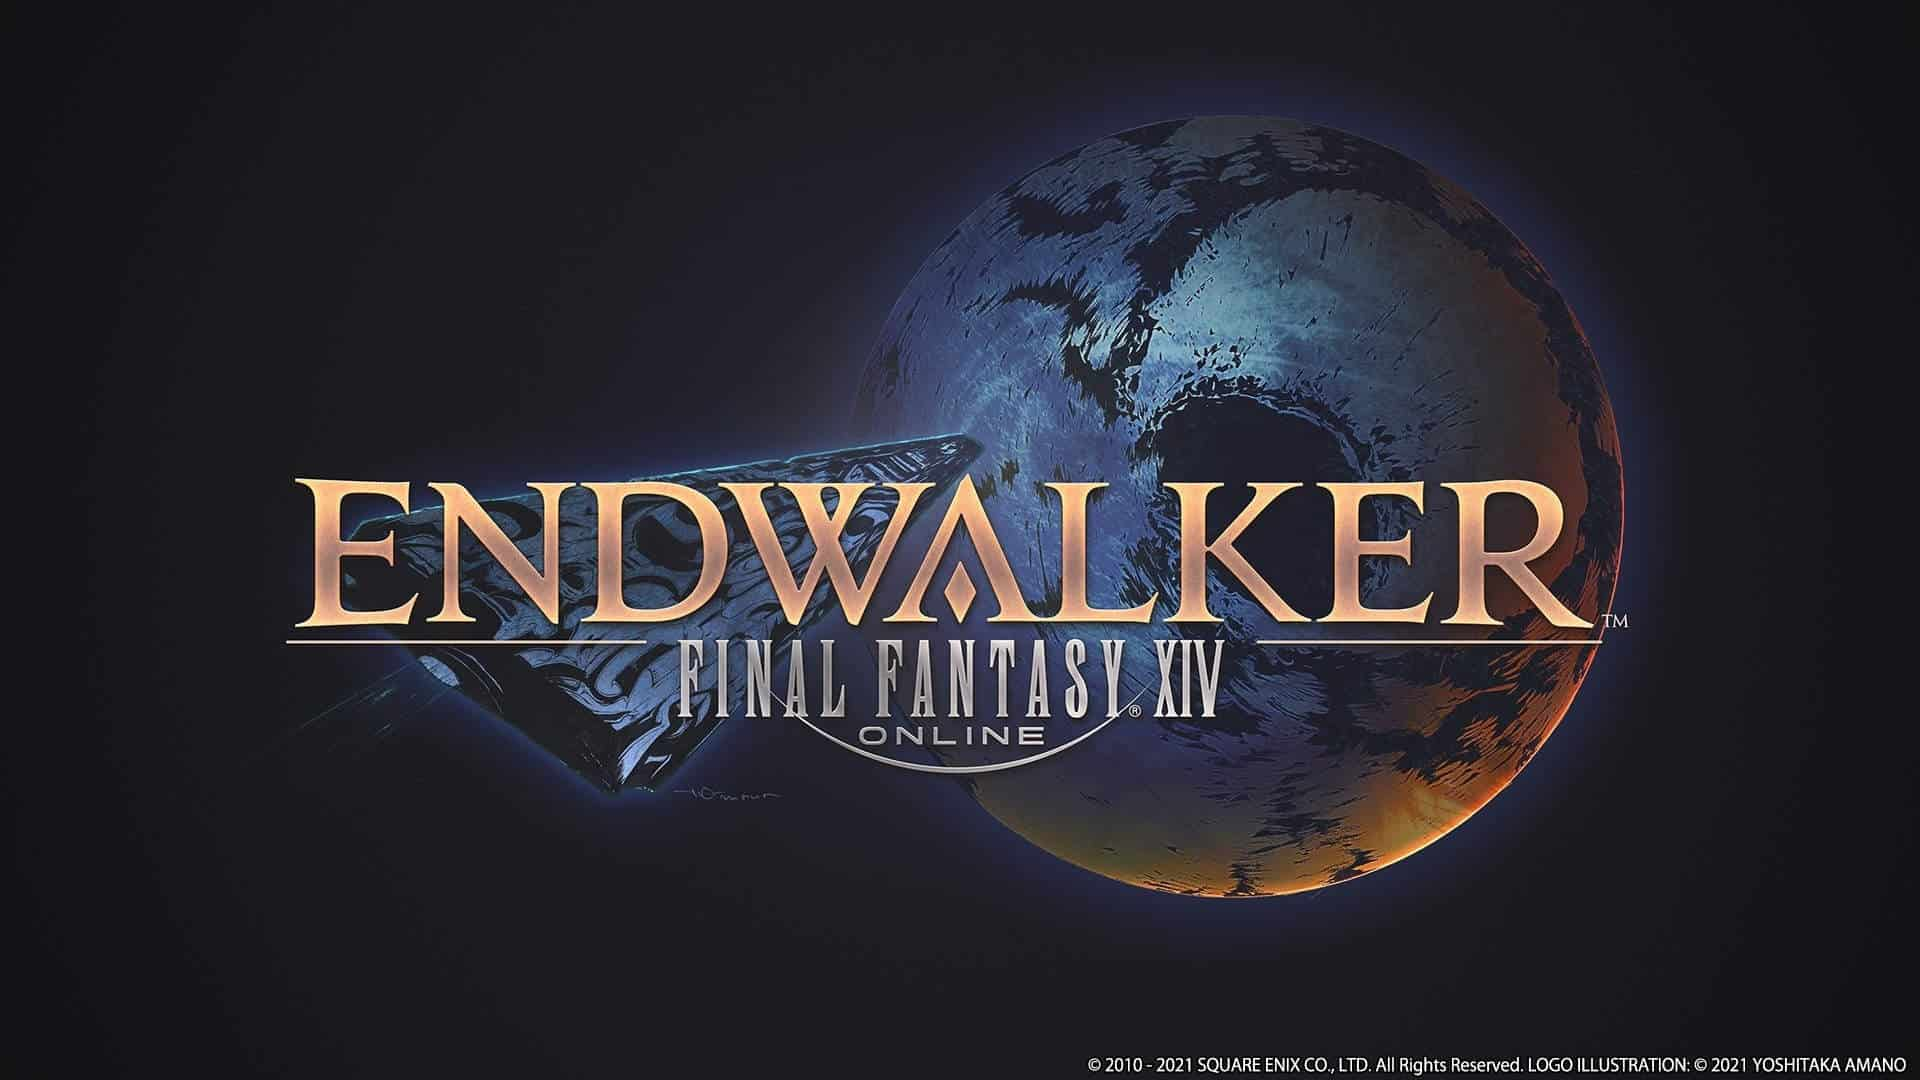 Final Fantasy XIV Endwalker - NEw Expansion Announced 12